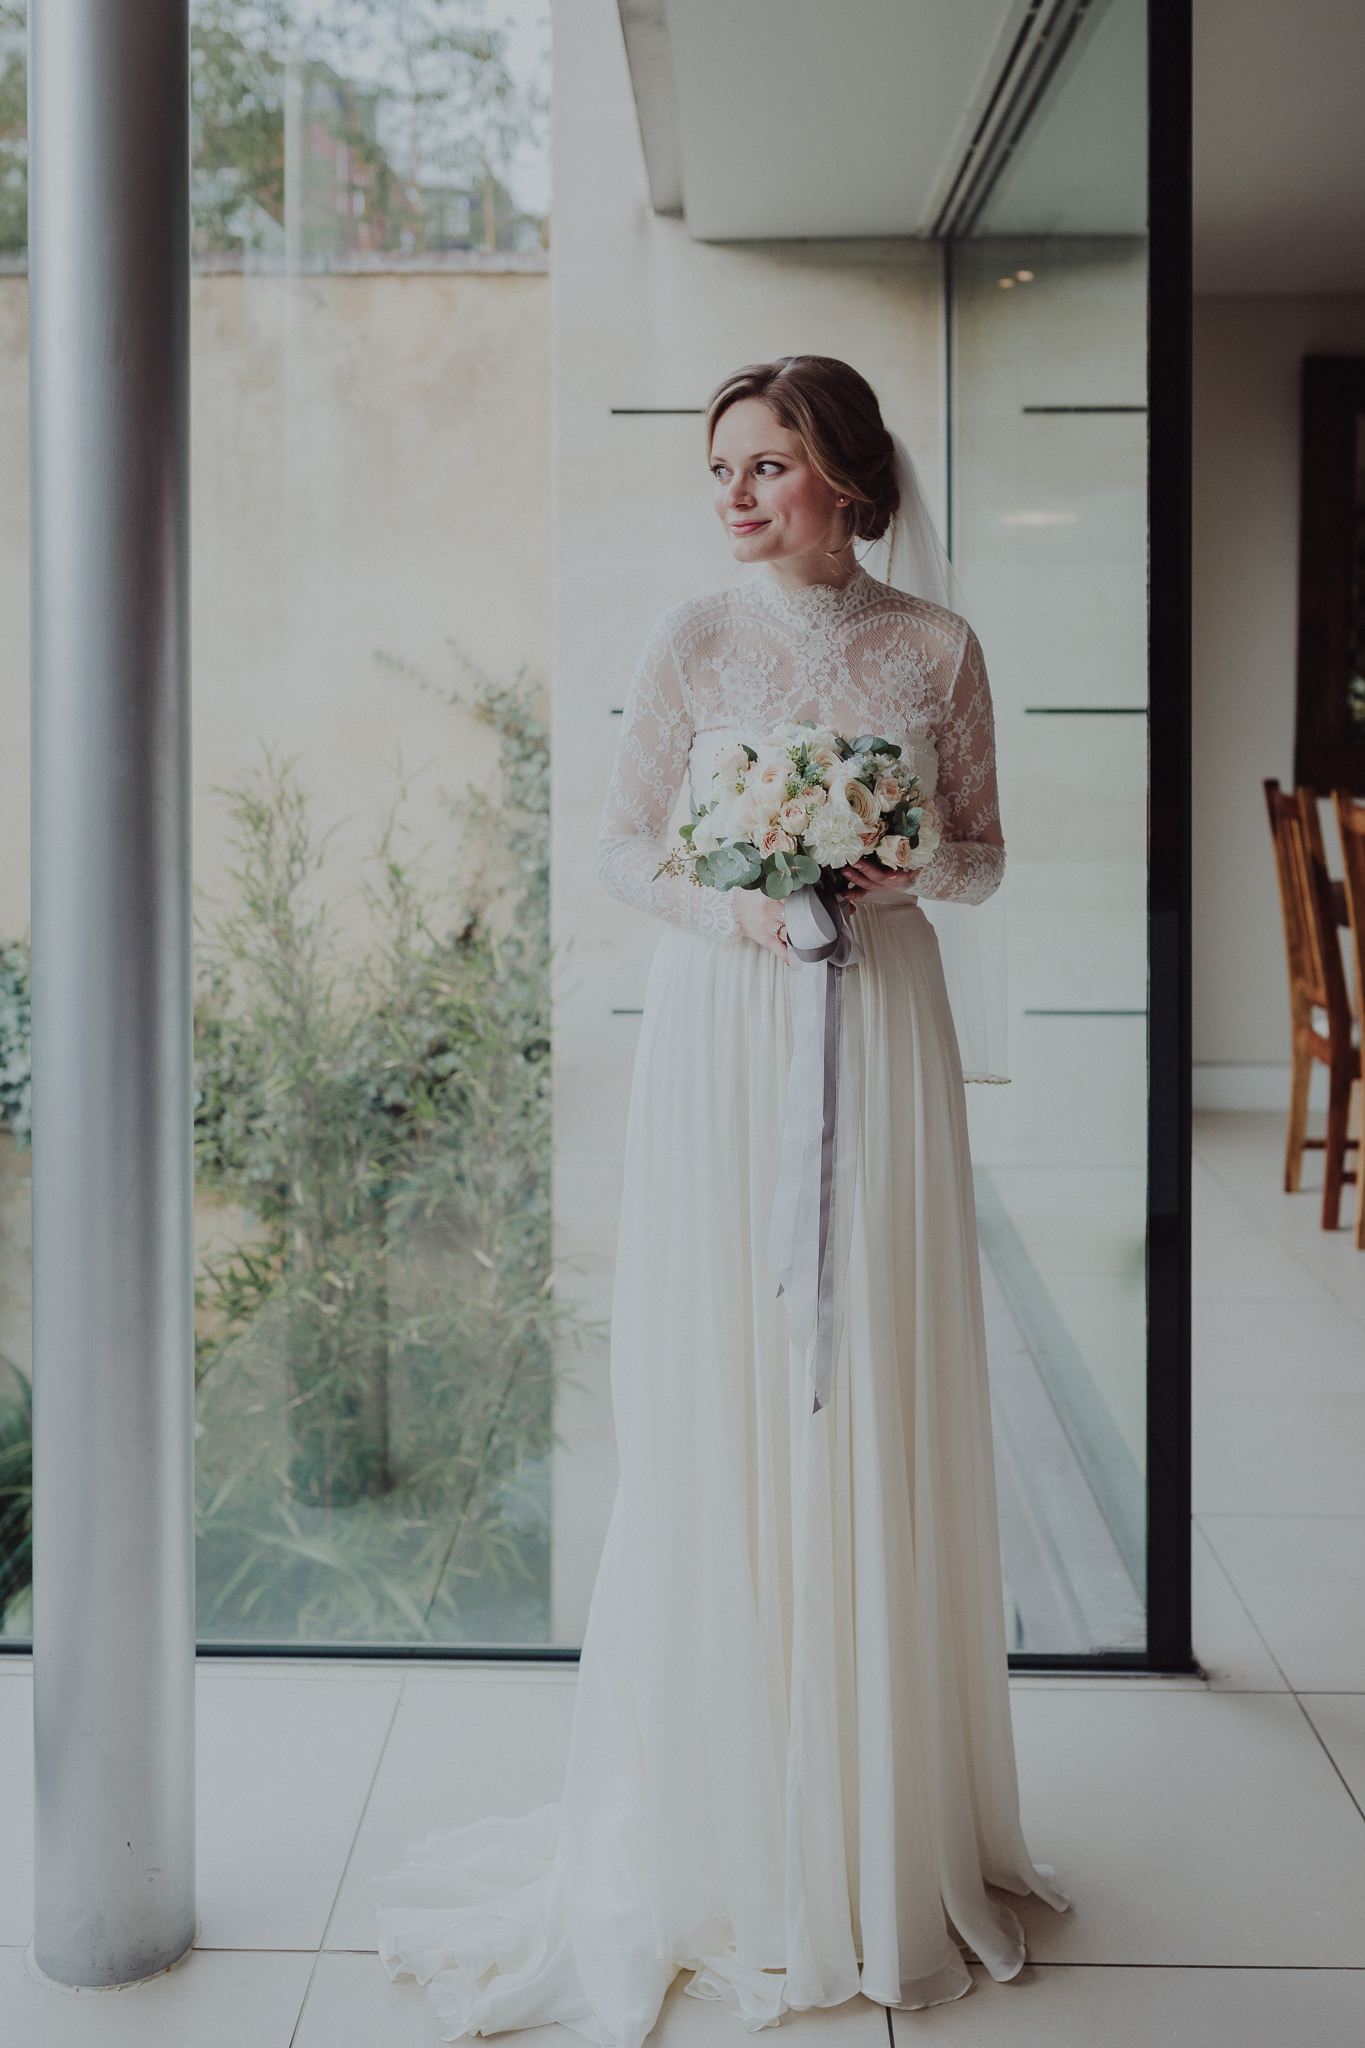 hampstead_wedding_photography_kate_gray-7.jpg